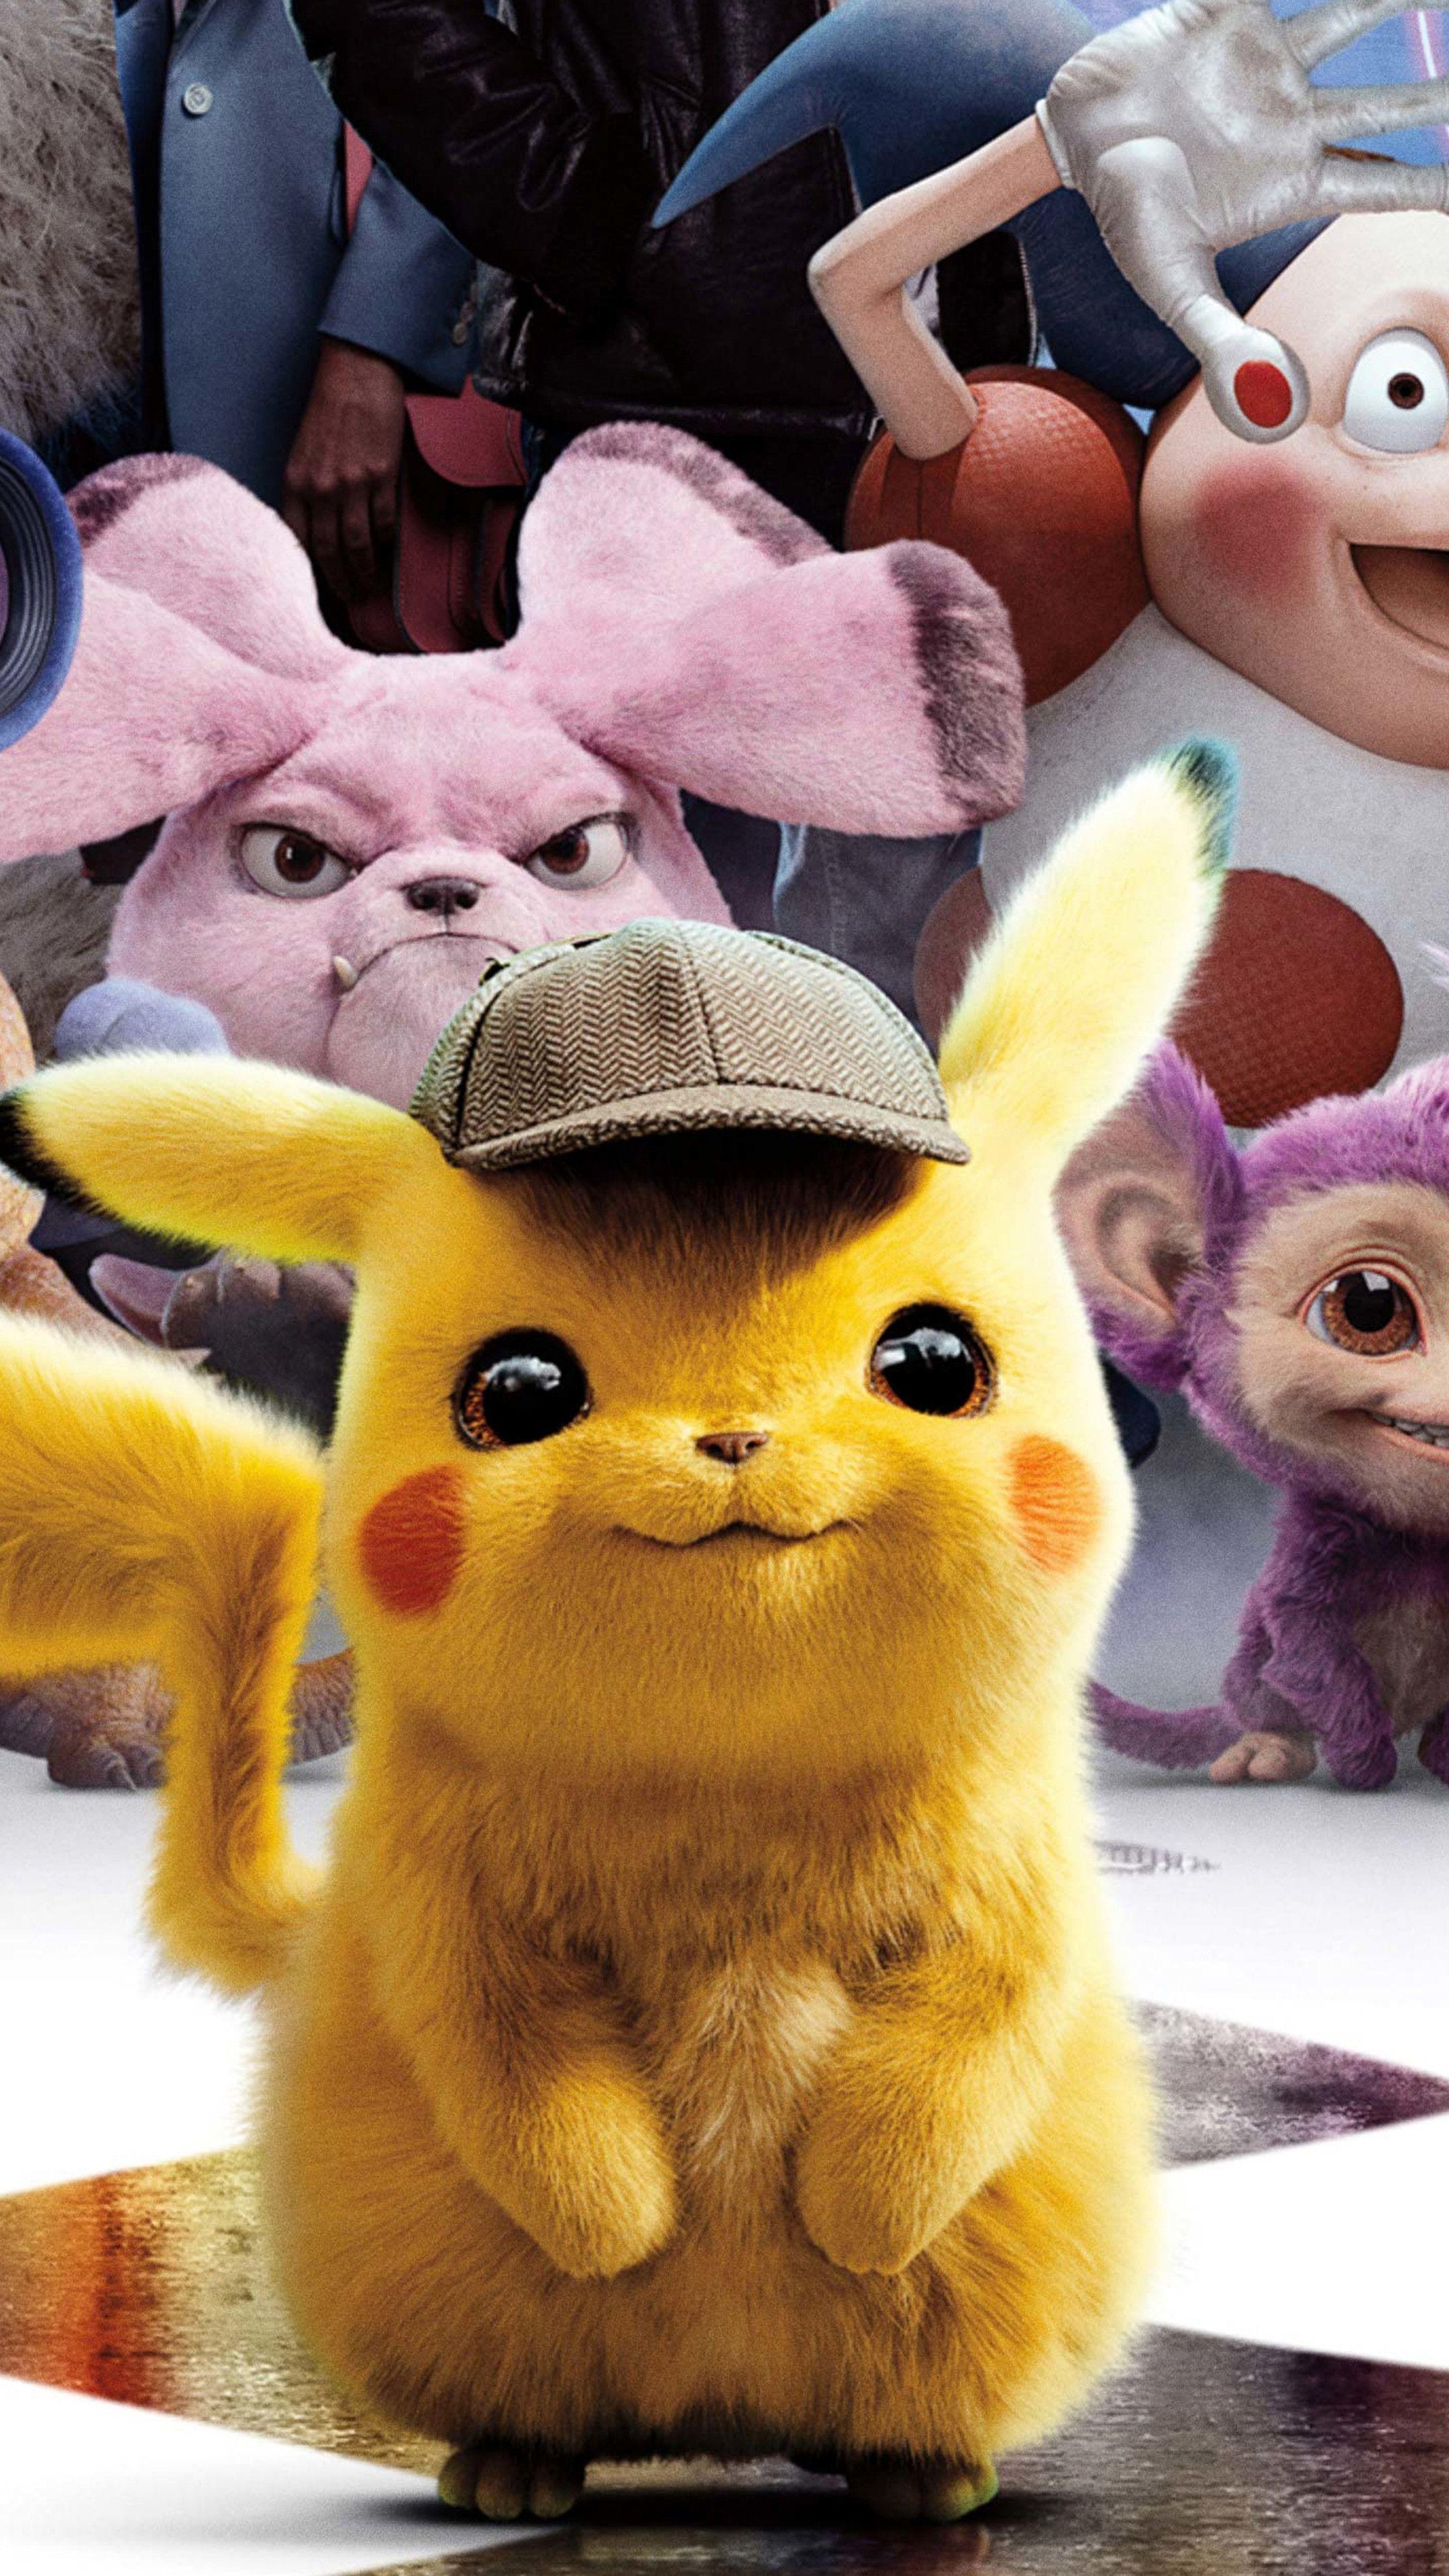 Pikachu Full HD iPhone Wallpapers - Wallpaper Cave